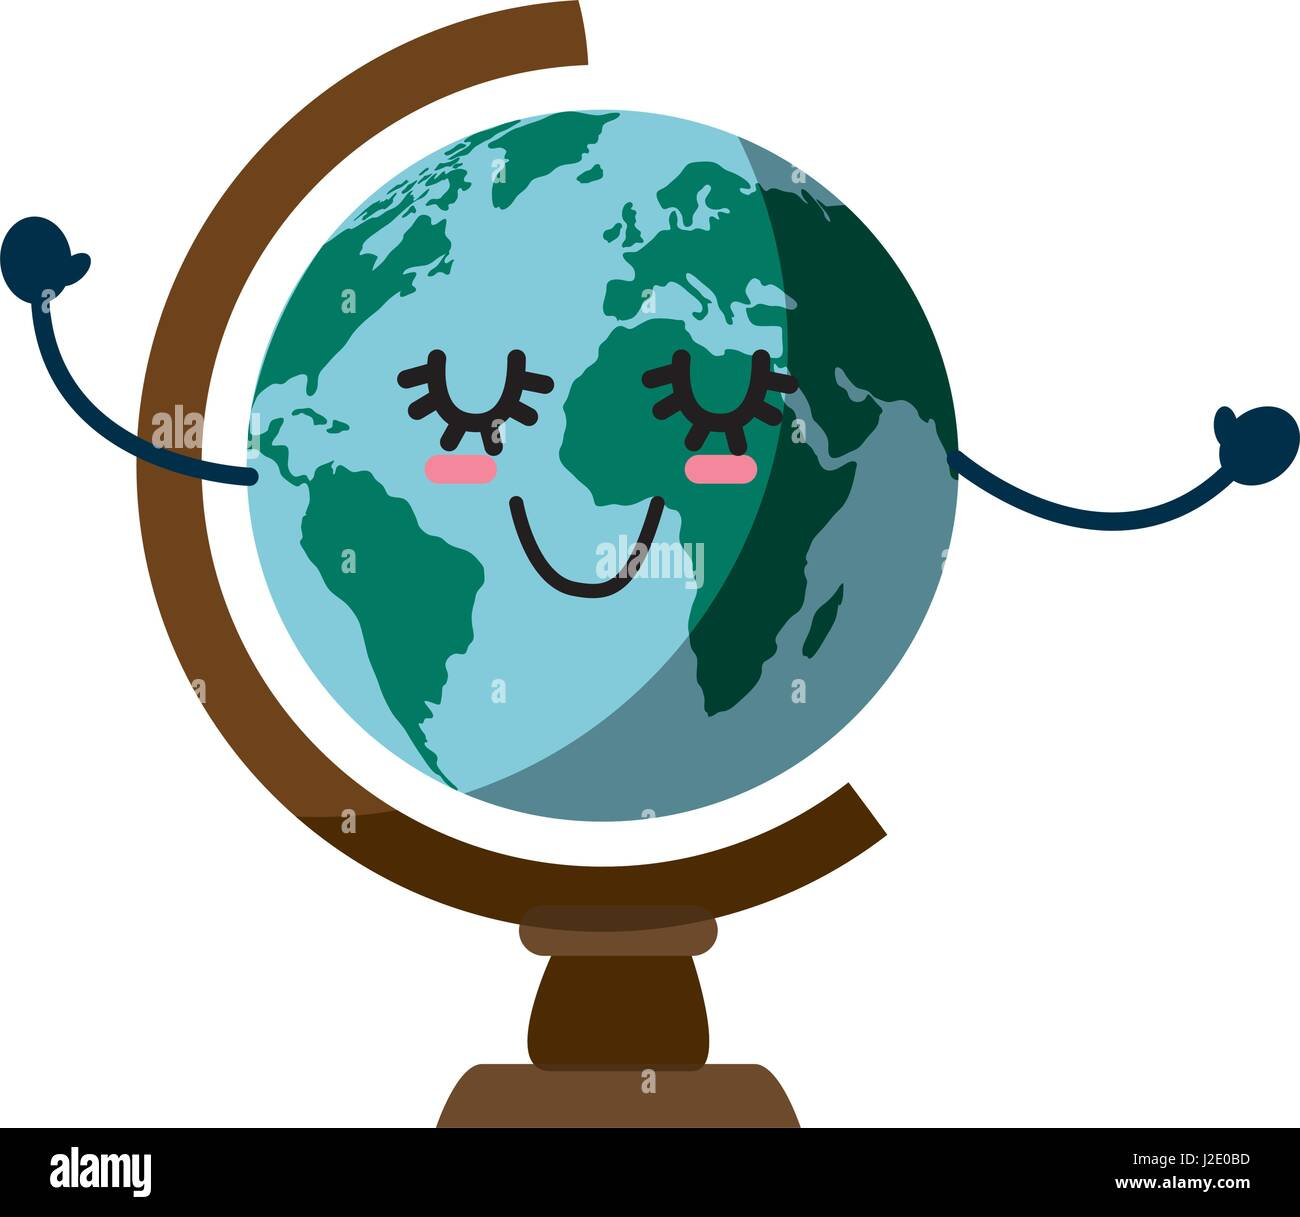 World globe cartoon stock vector art illustration vector image world globe cartoon sciox Images